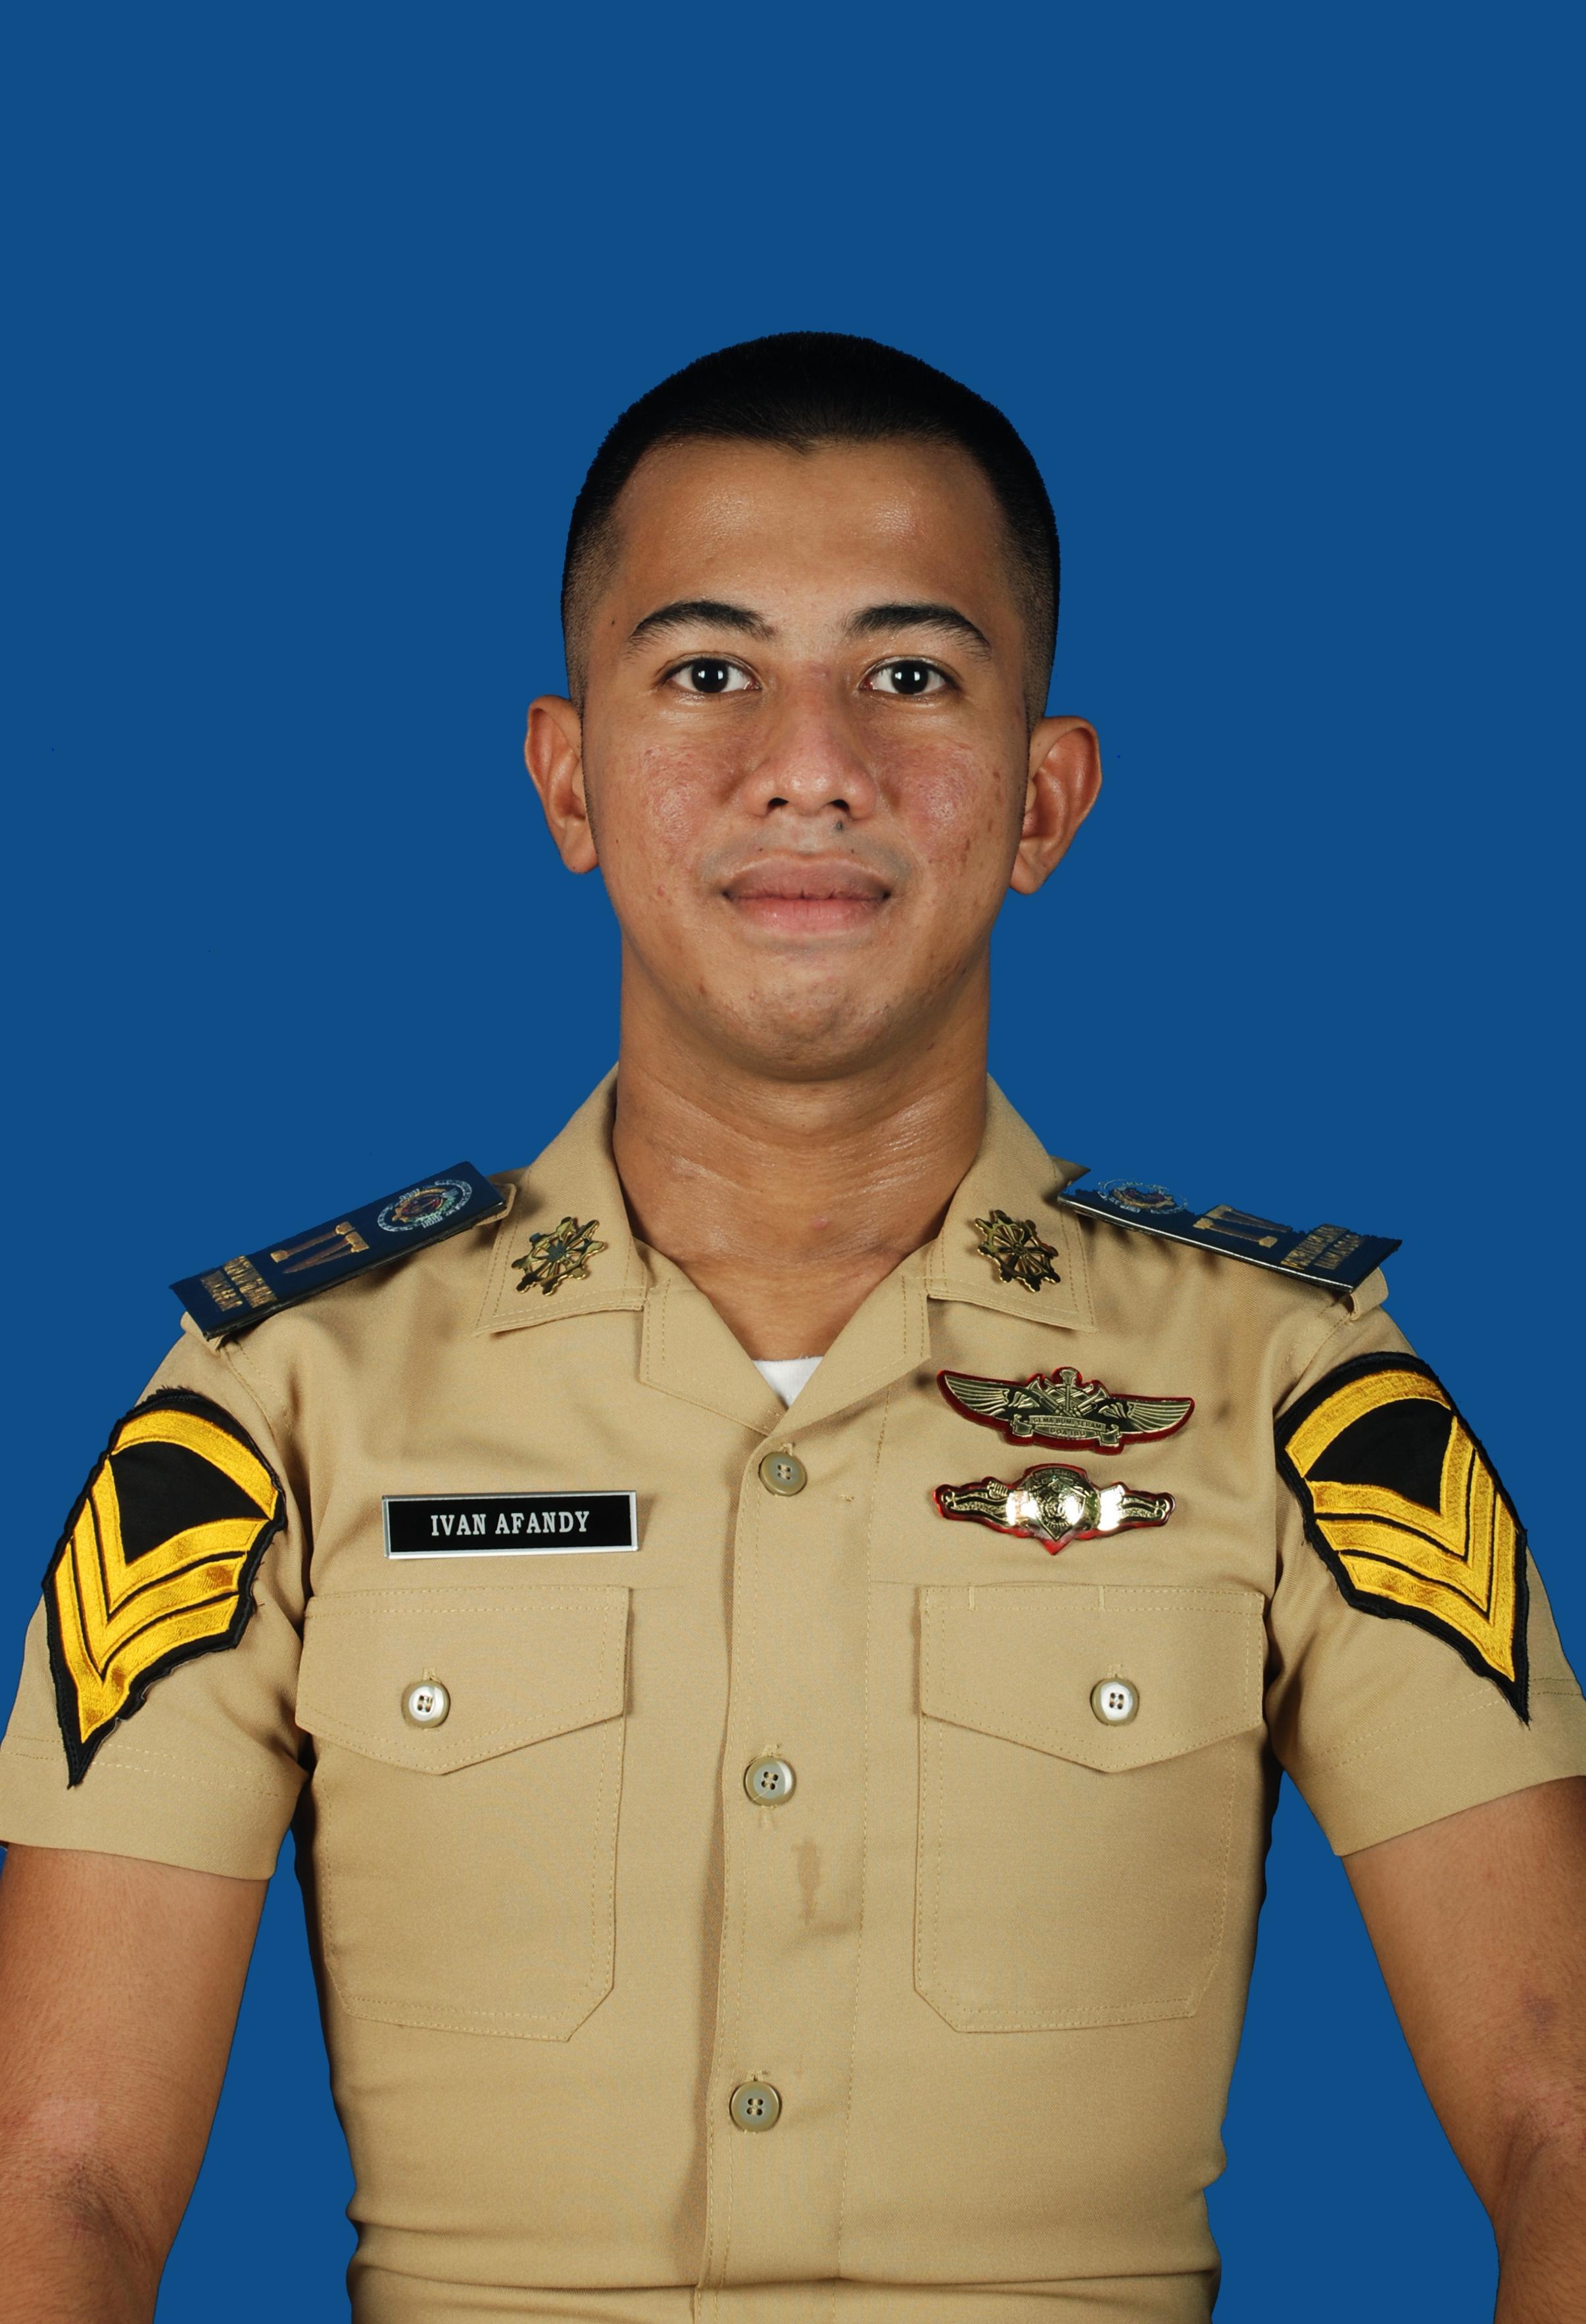 IVAN AFANDY seafarer Deck Cadet (Trainee) Oil products tanker